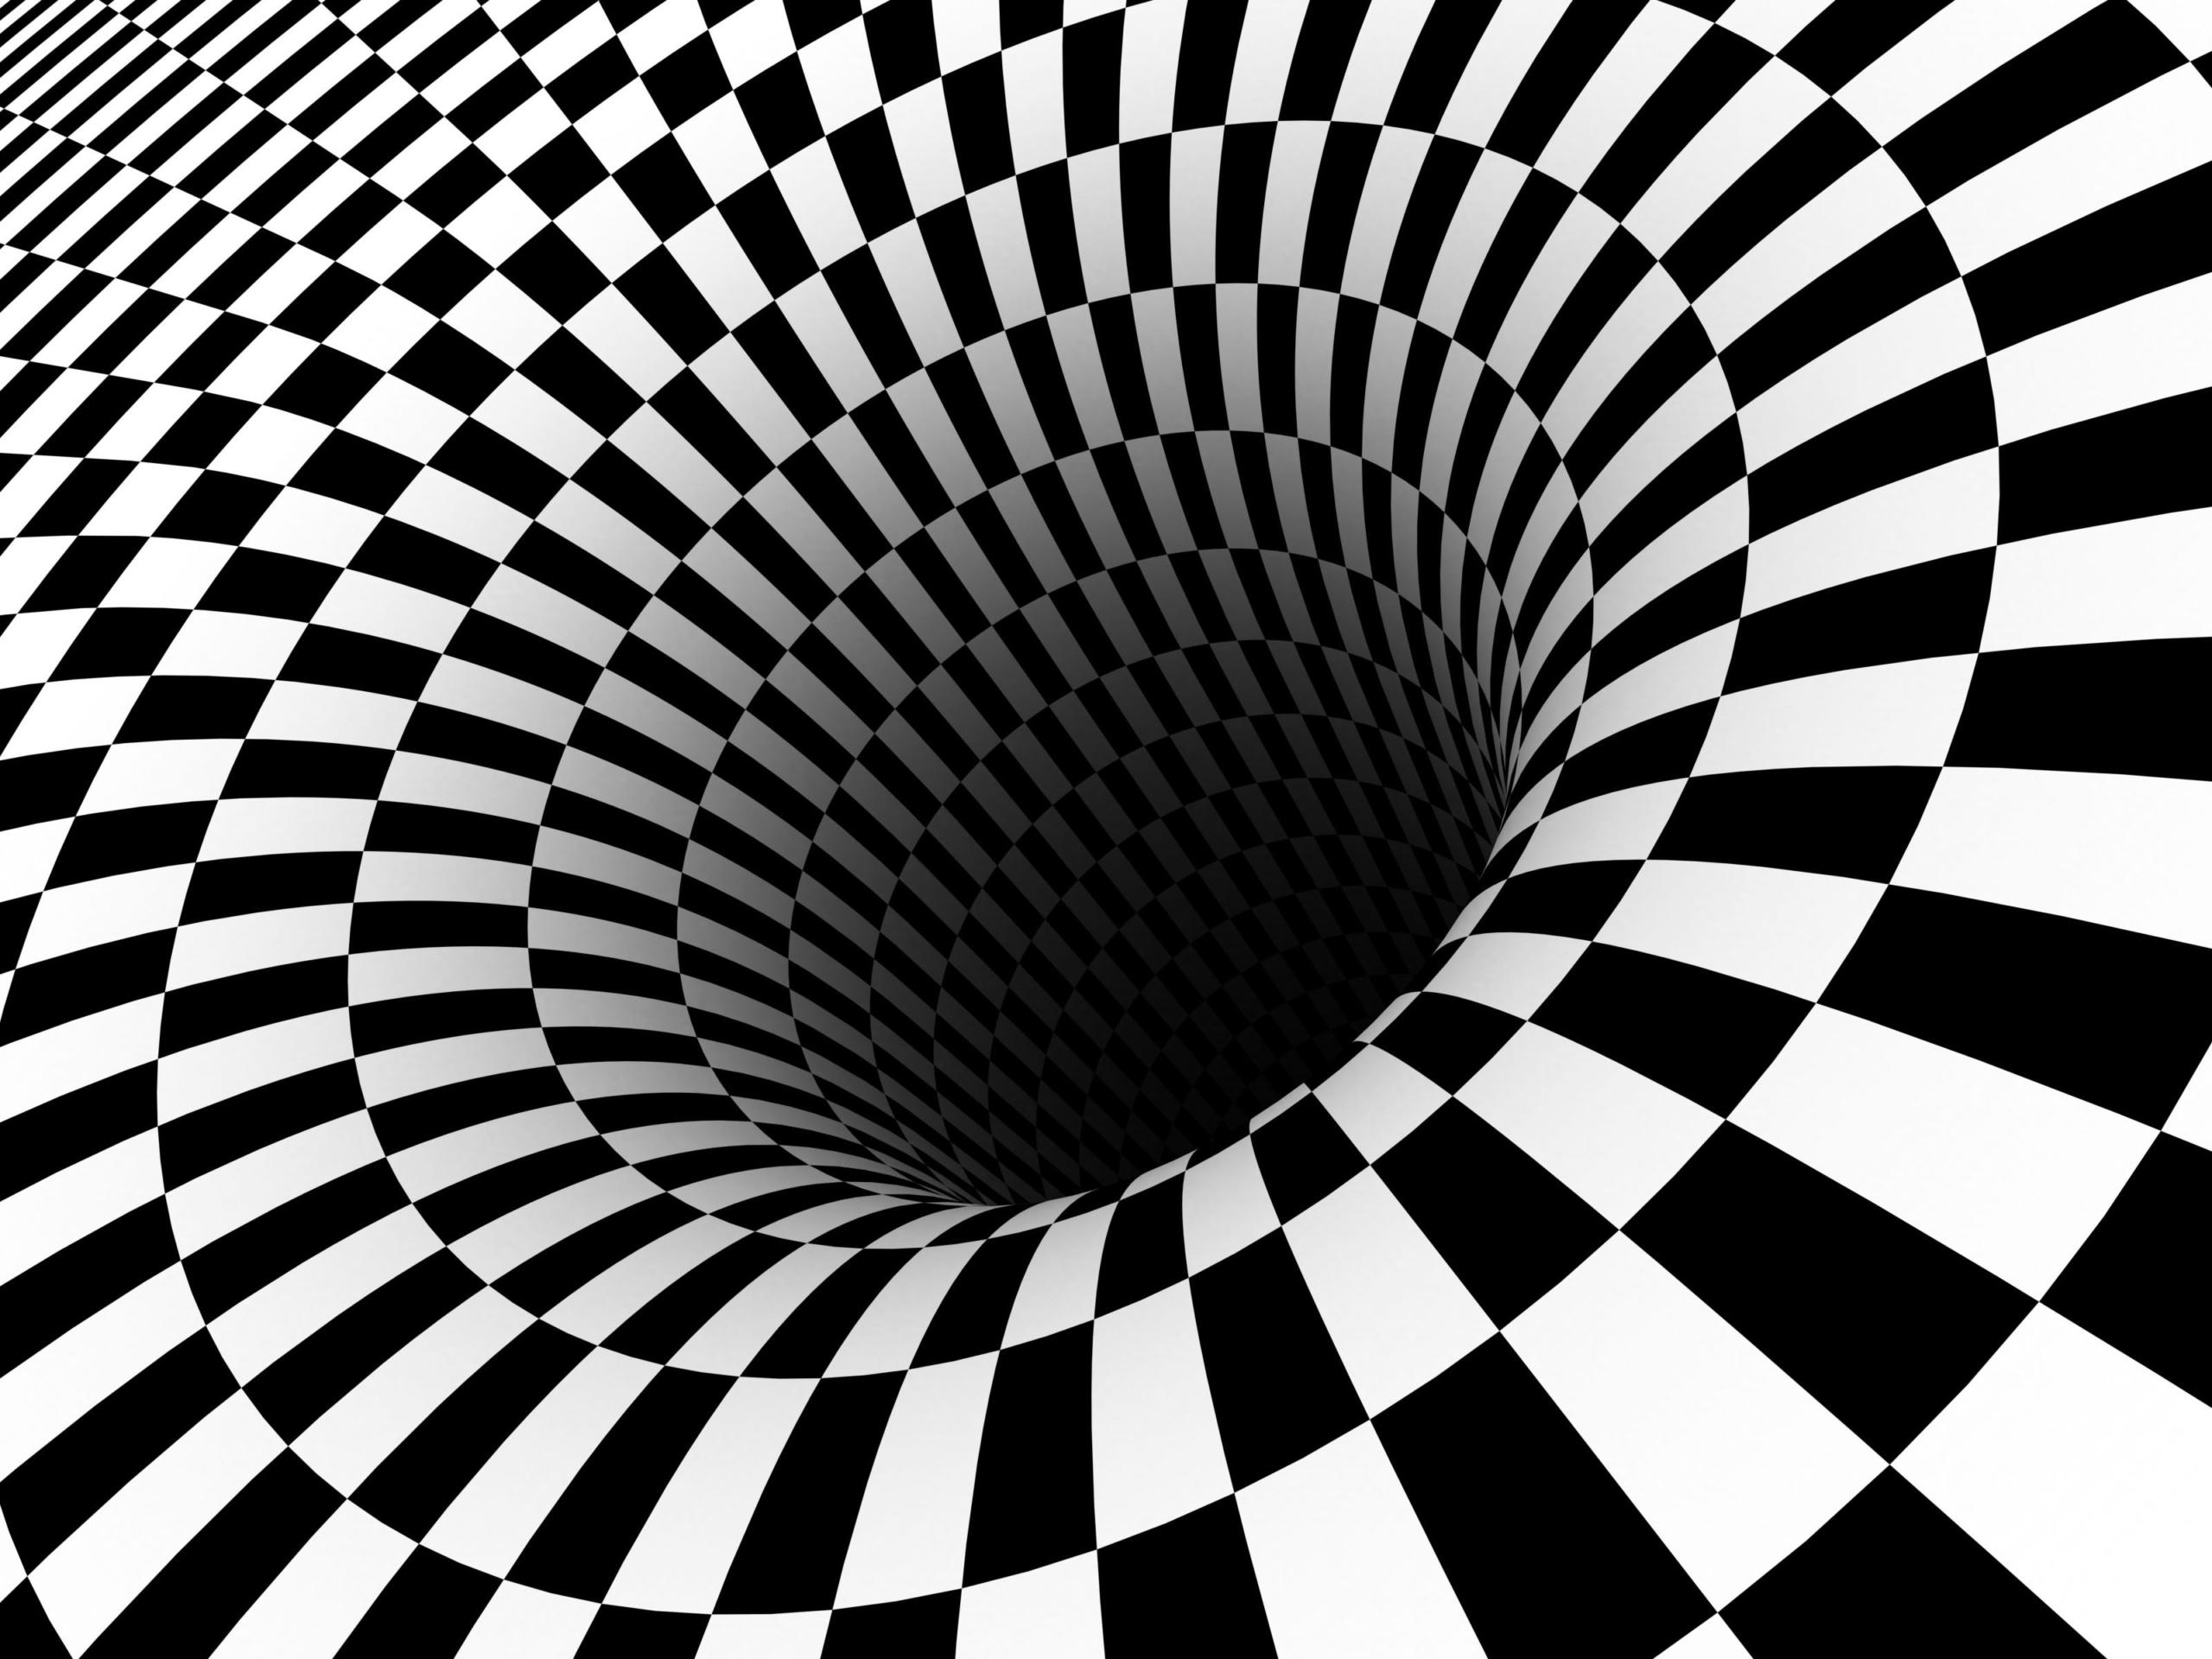 How to Achieve an Impressive illusion Picture design